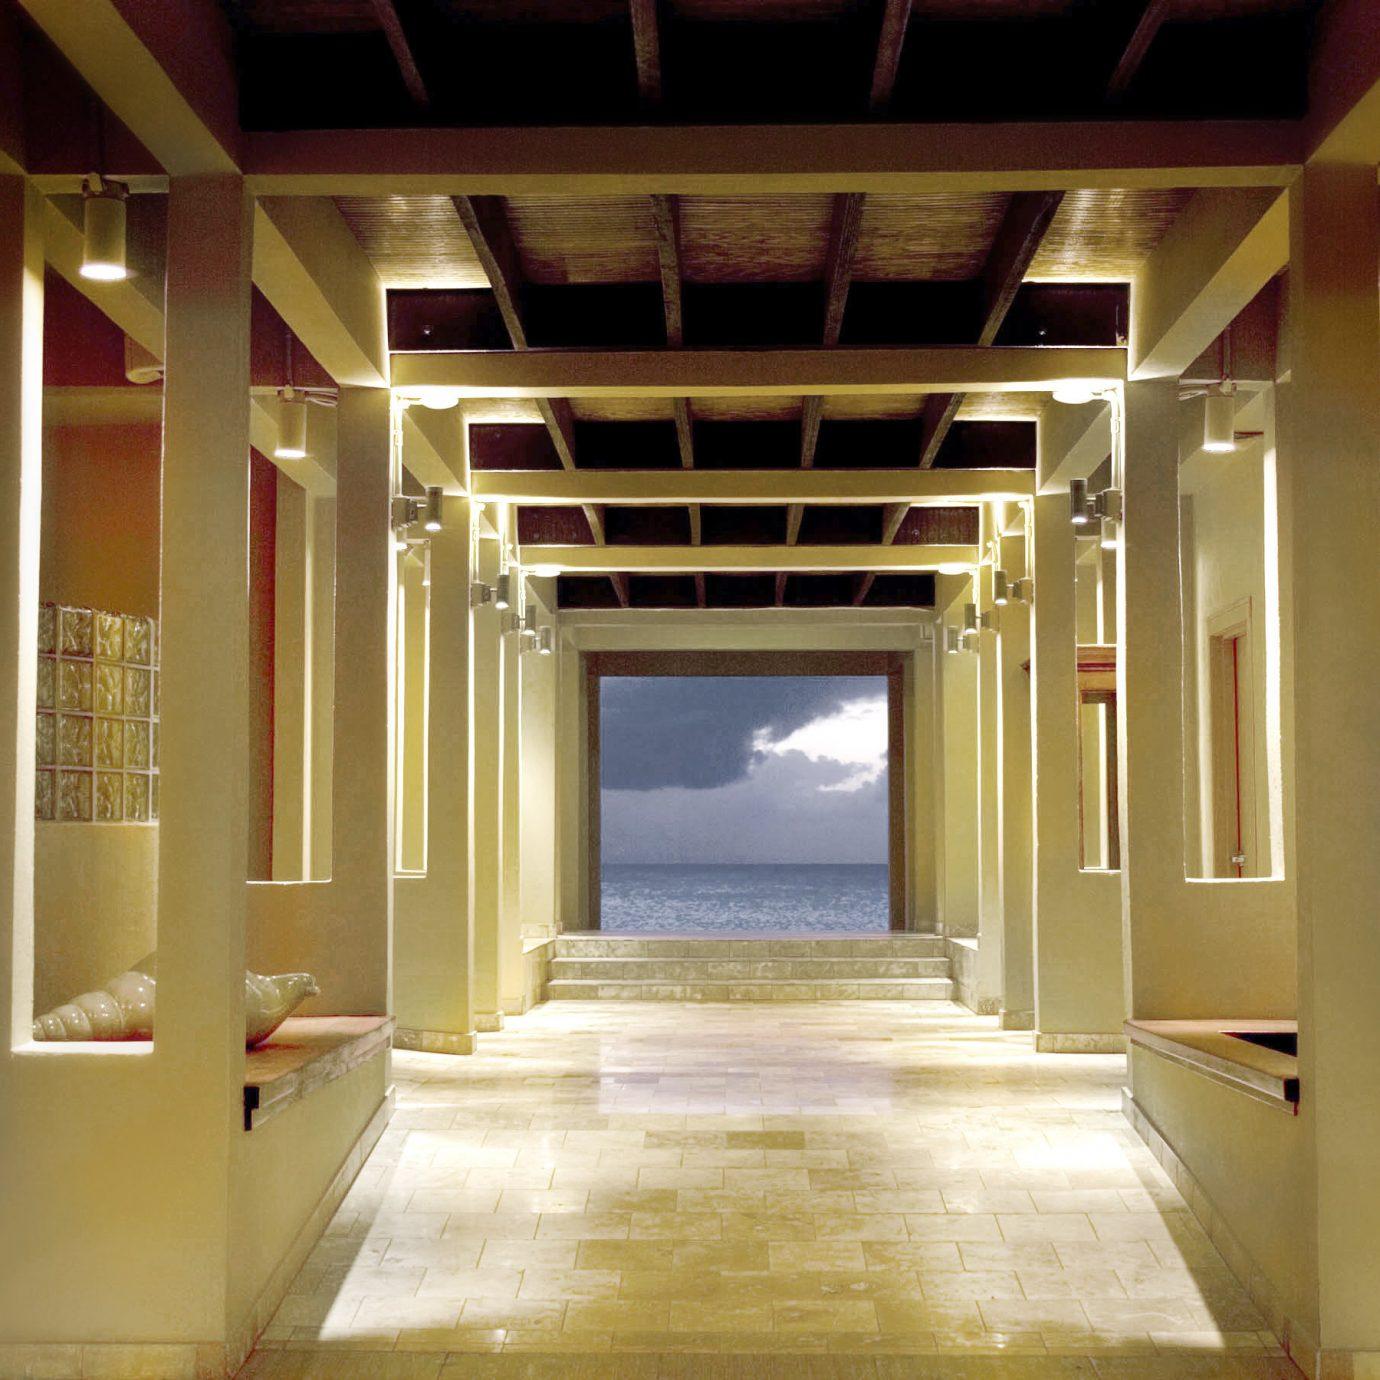 Family Honeymoon Island Lobby Romance Romantic Scenic views Tropical Waterfront building Architecture hall tourist attraction auditorium